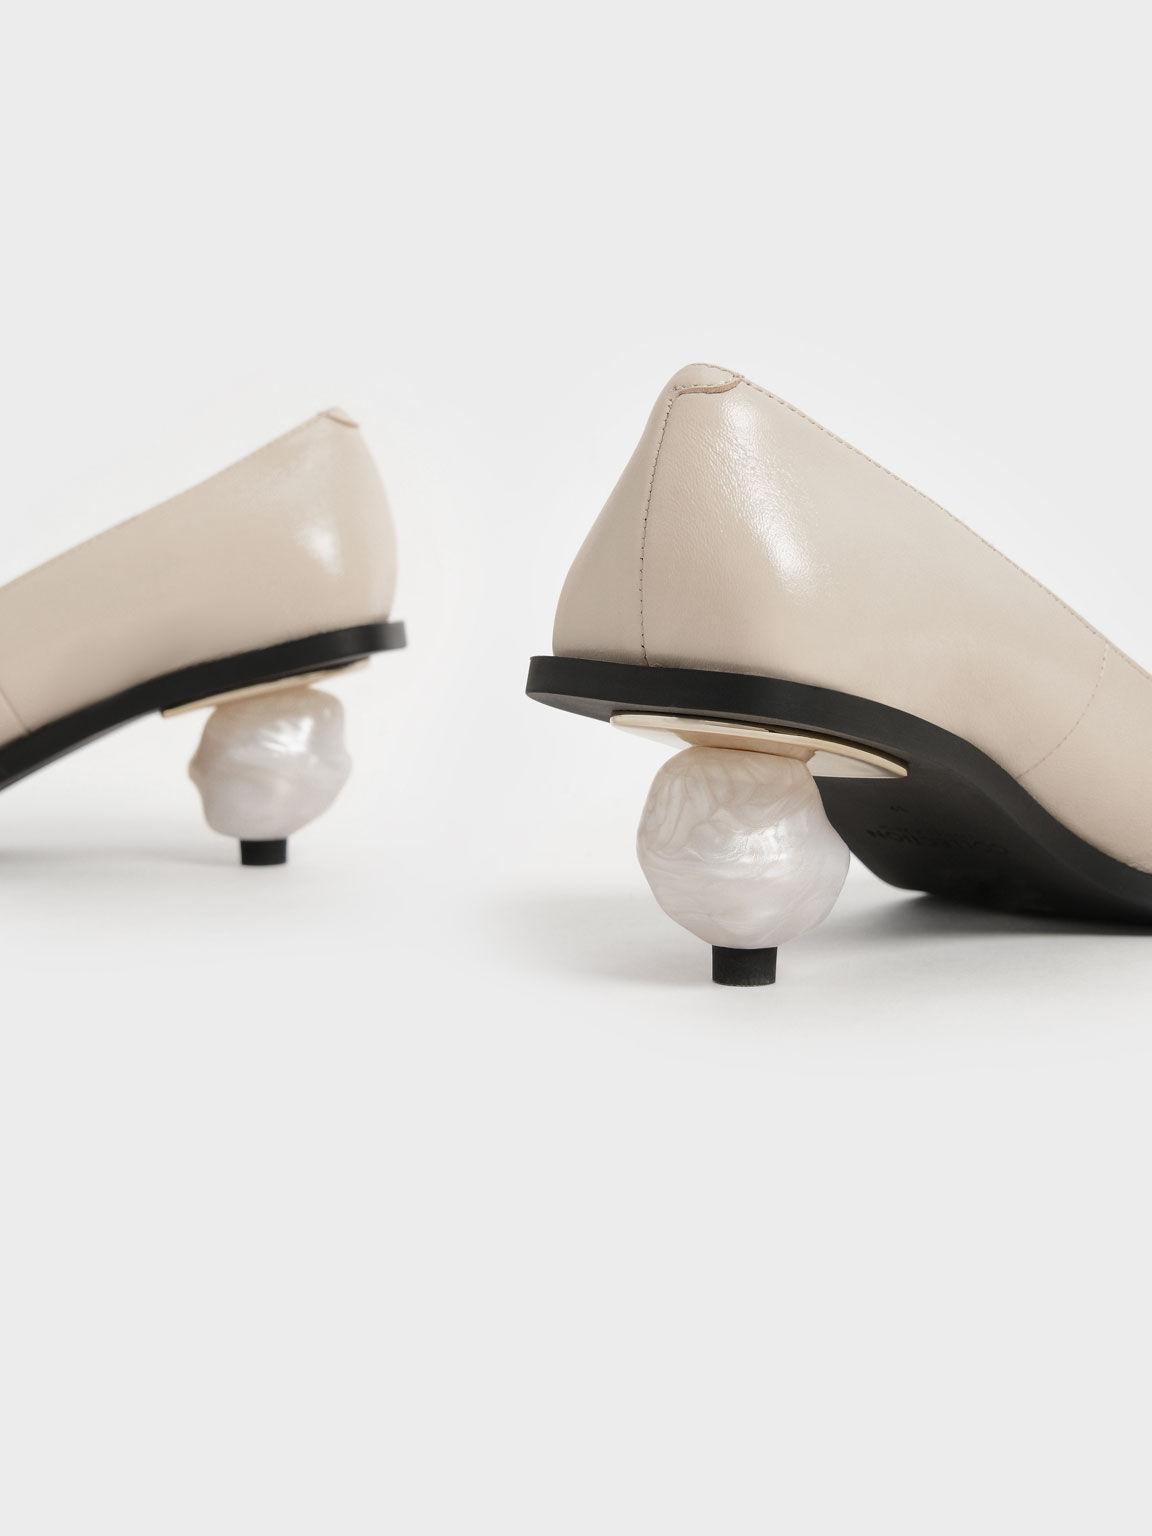 Sculptural Heel Pumps (Kid Leather), Beige, hi-res